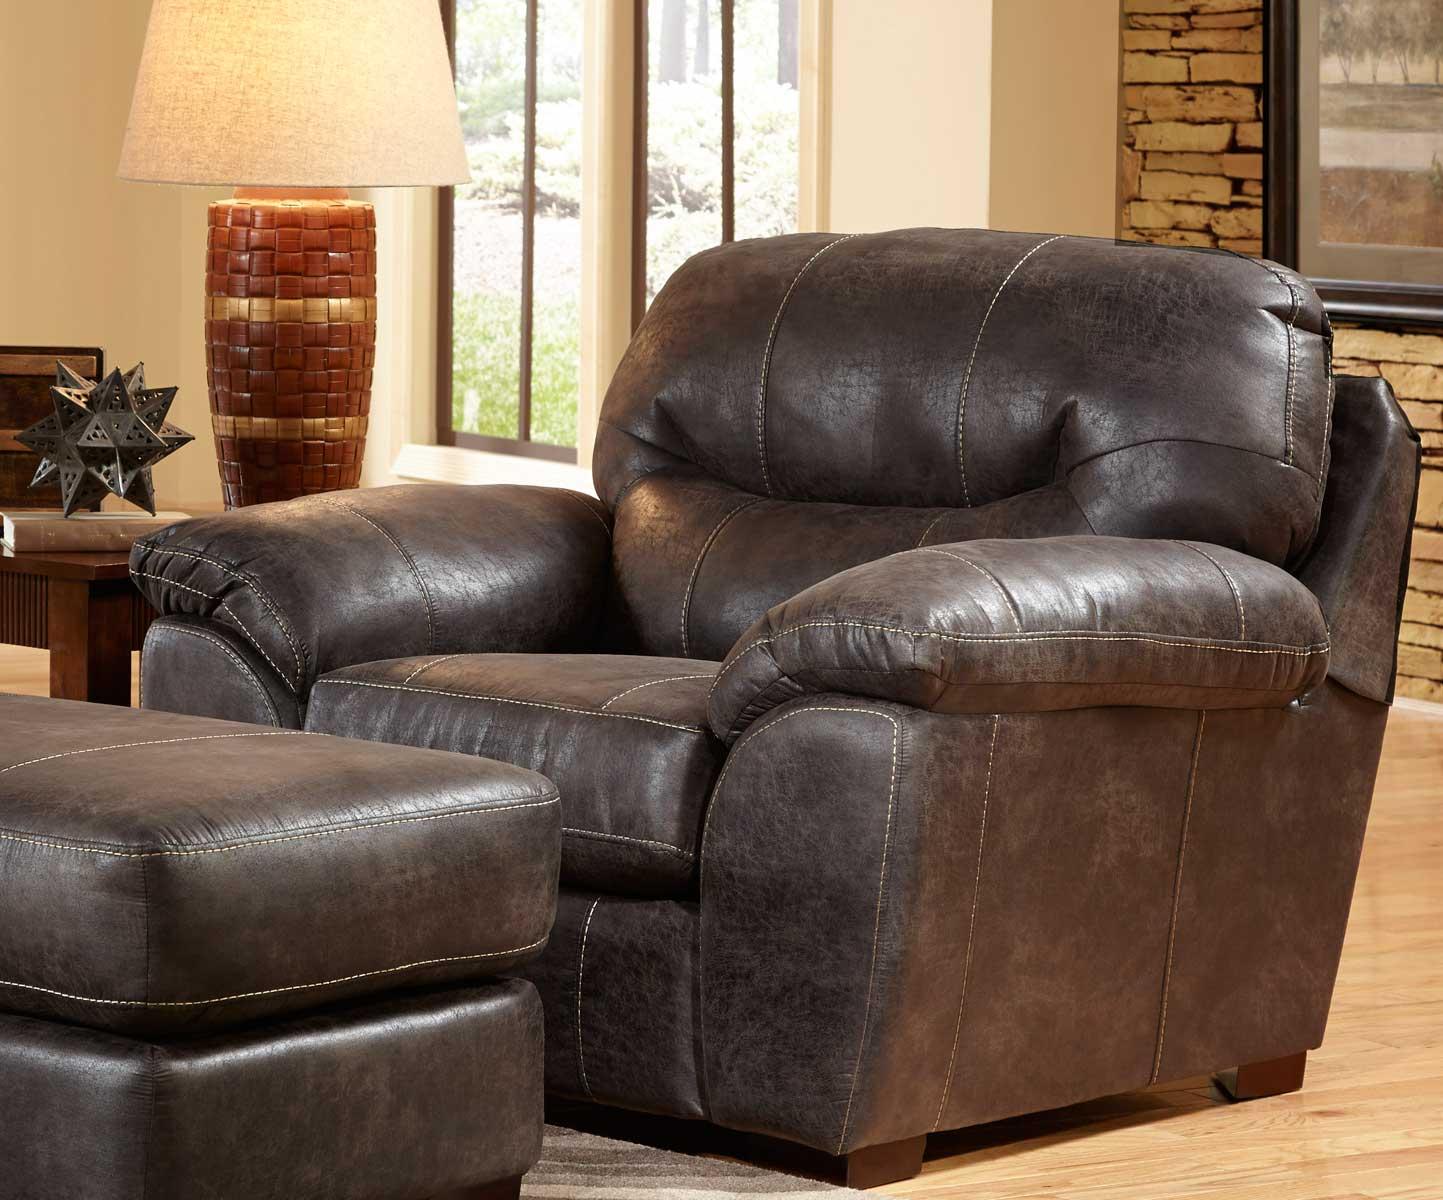 Jackson Grant Bonded Leather Sofa Set Steel Jf 4453 Sofa